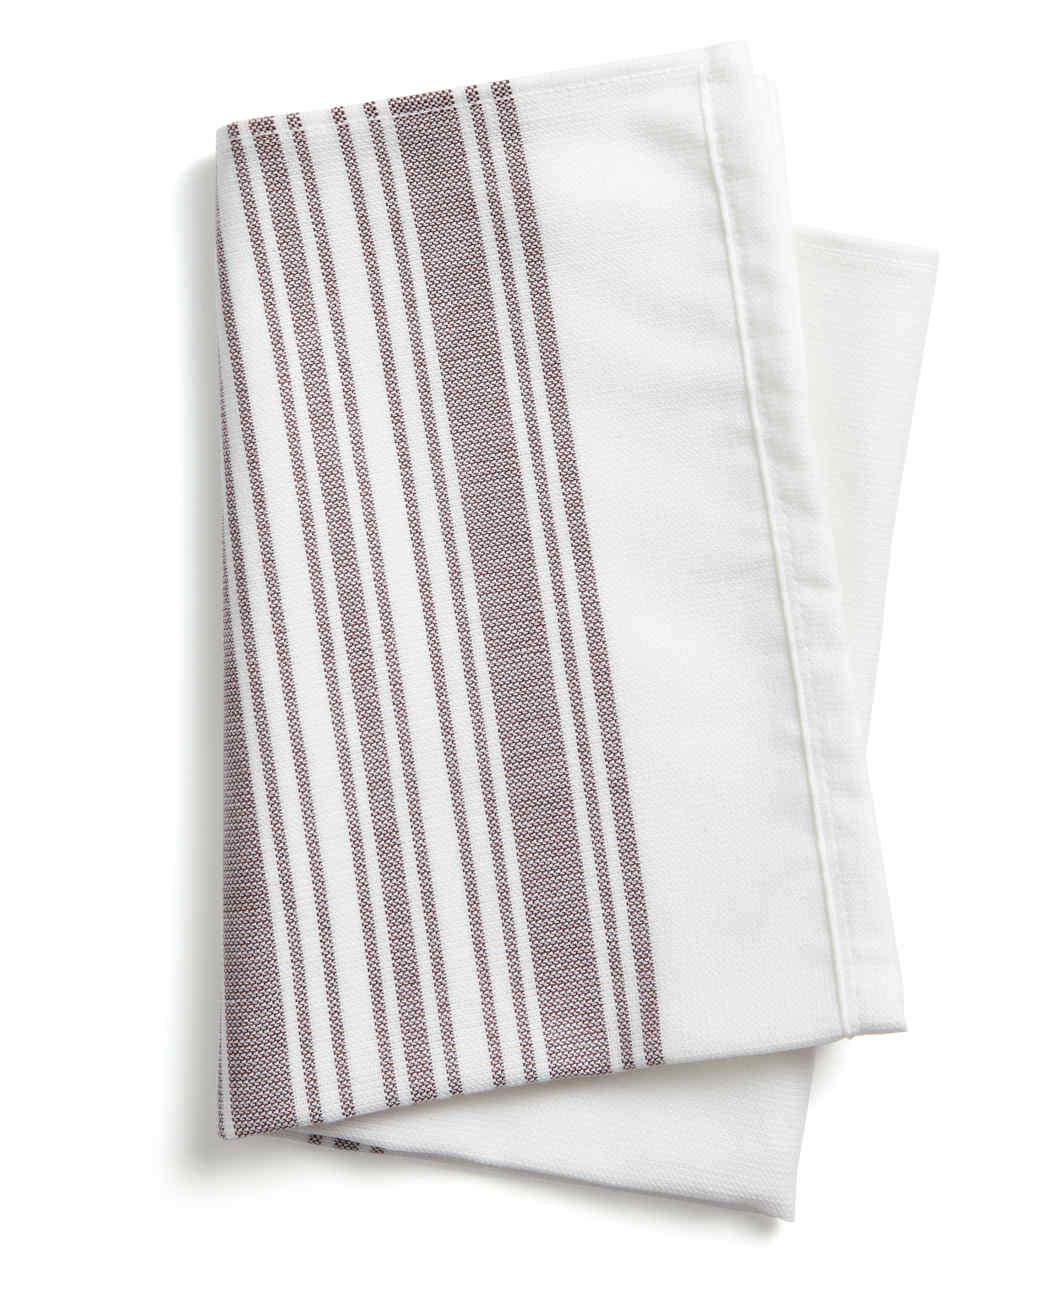 cloth-napkin-088-mld110351.jpg